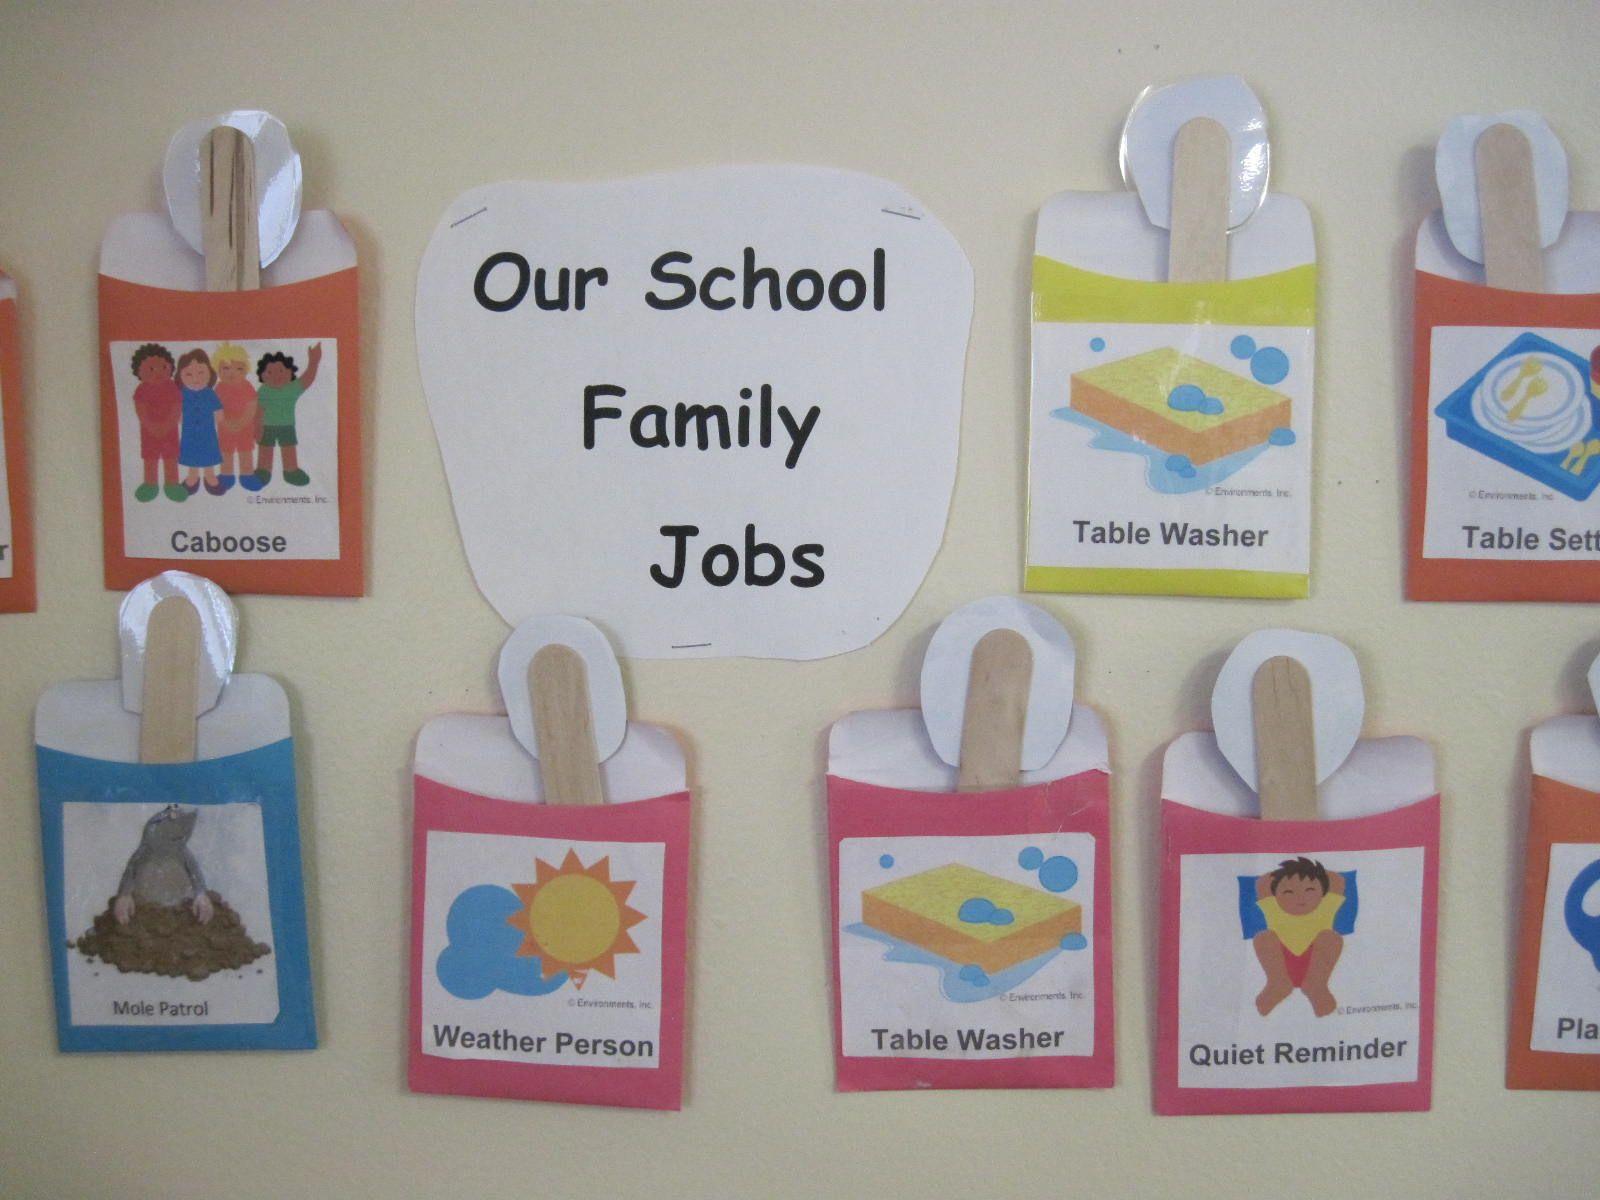 Mrs. Darcey's School Family Jobs Reusable tote, Reusable